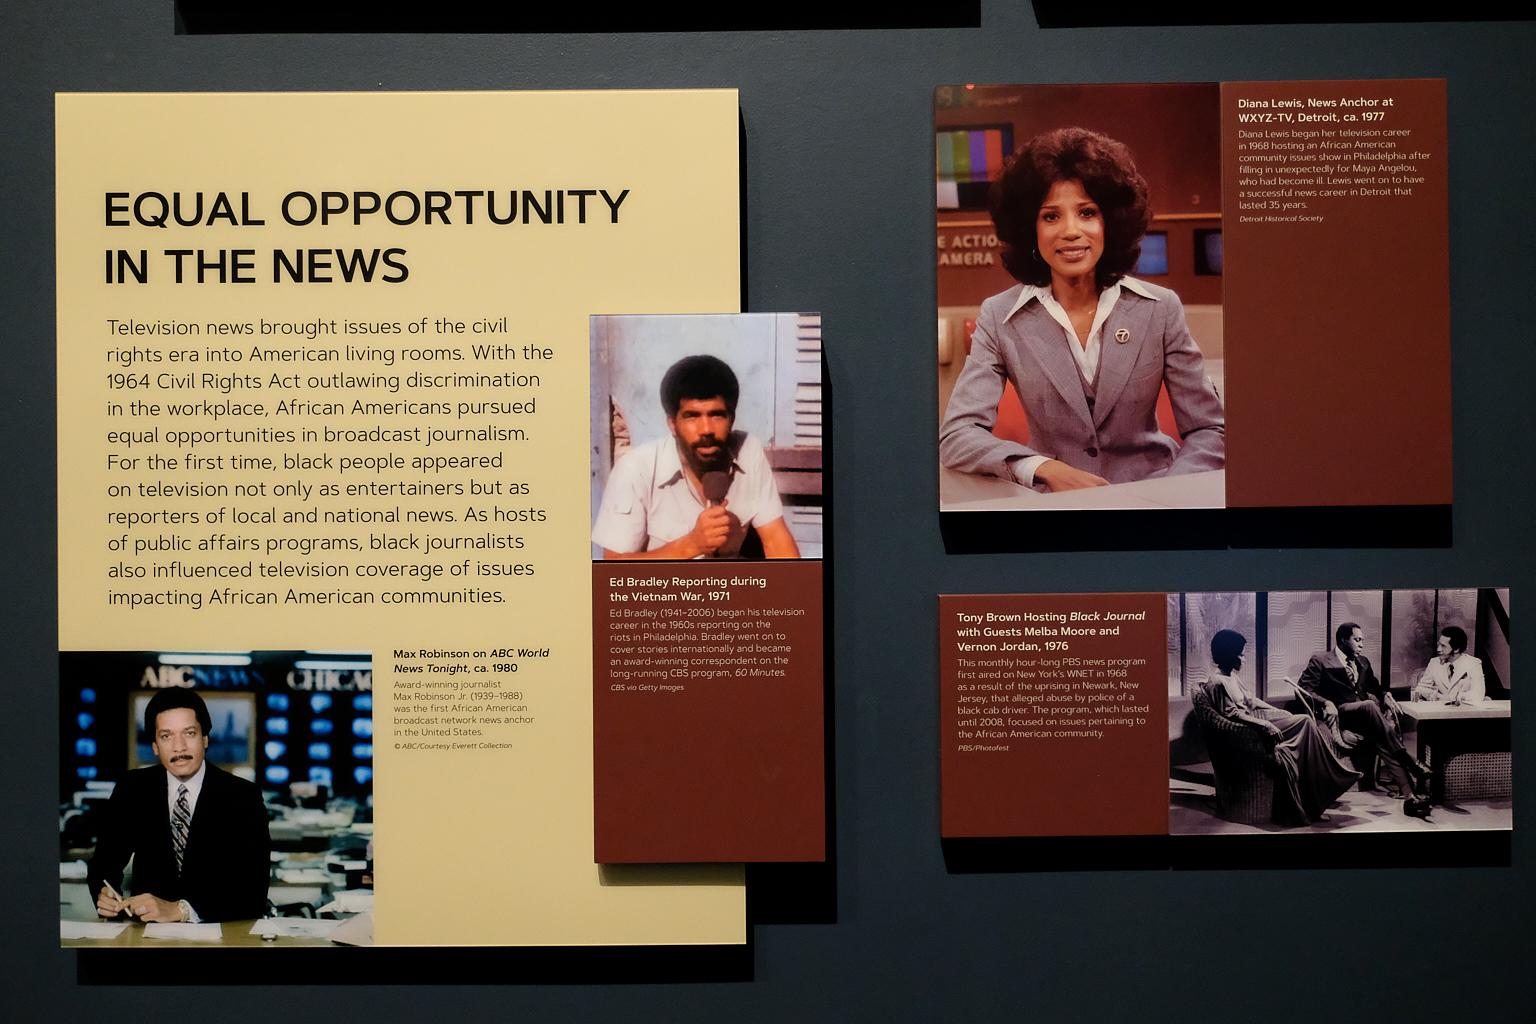 NMAAHC_Oprah_Exhibit_2018-09-26-013.jpg